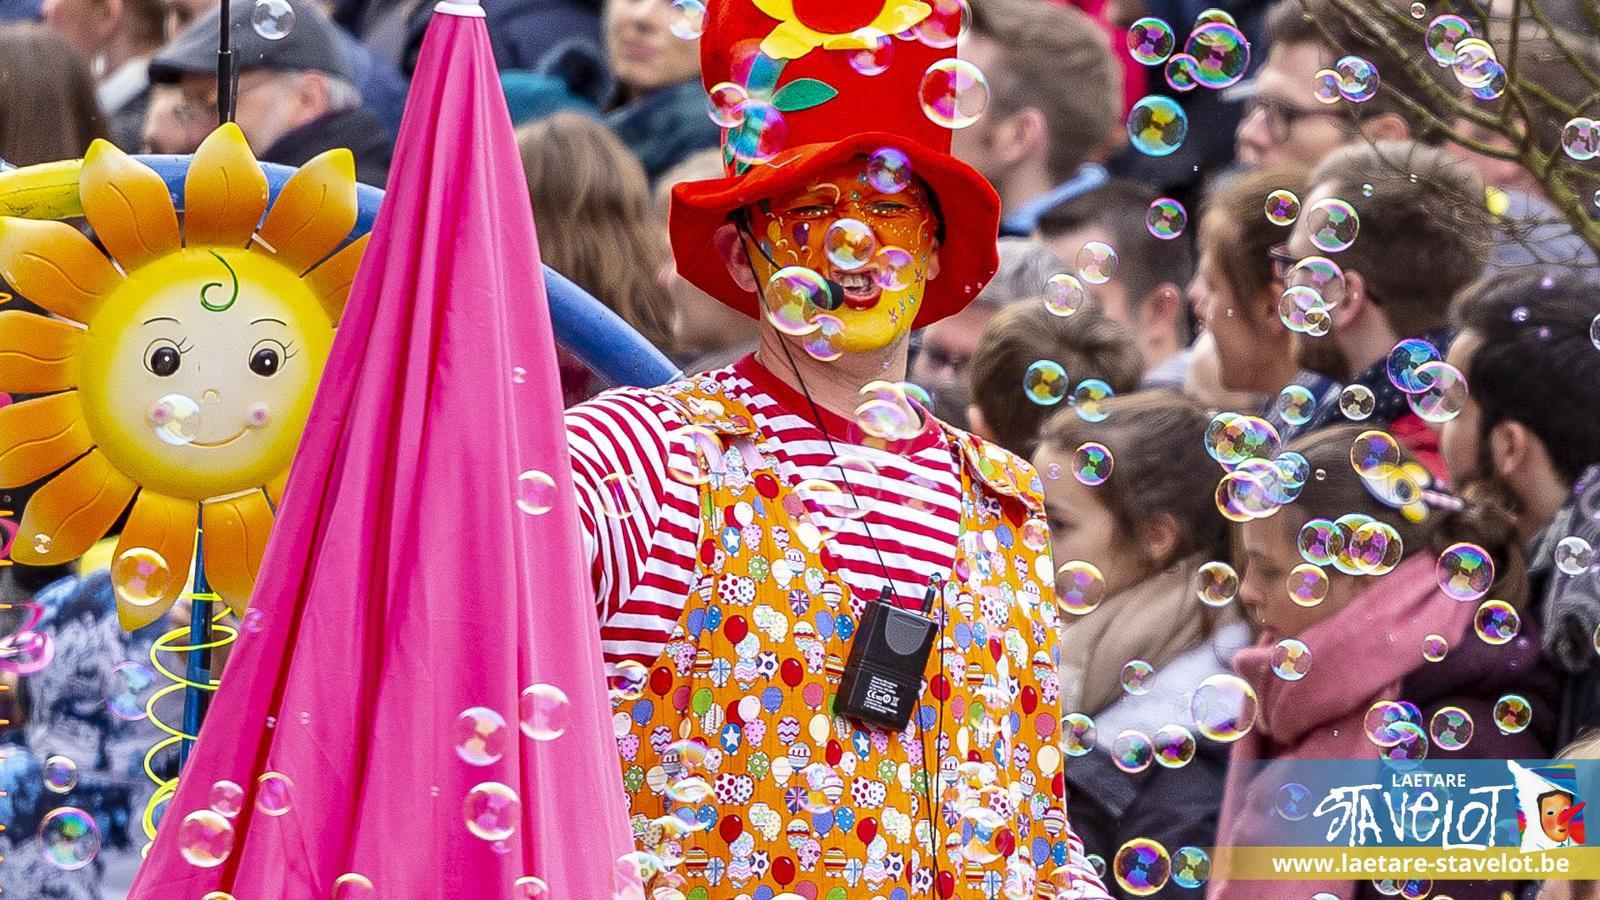 laetare-stavelot-2018-24-clown-cylistes-06